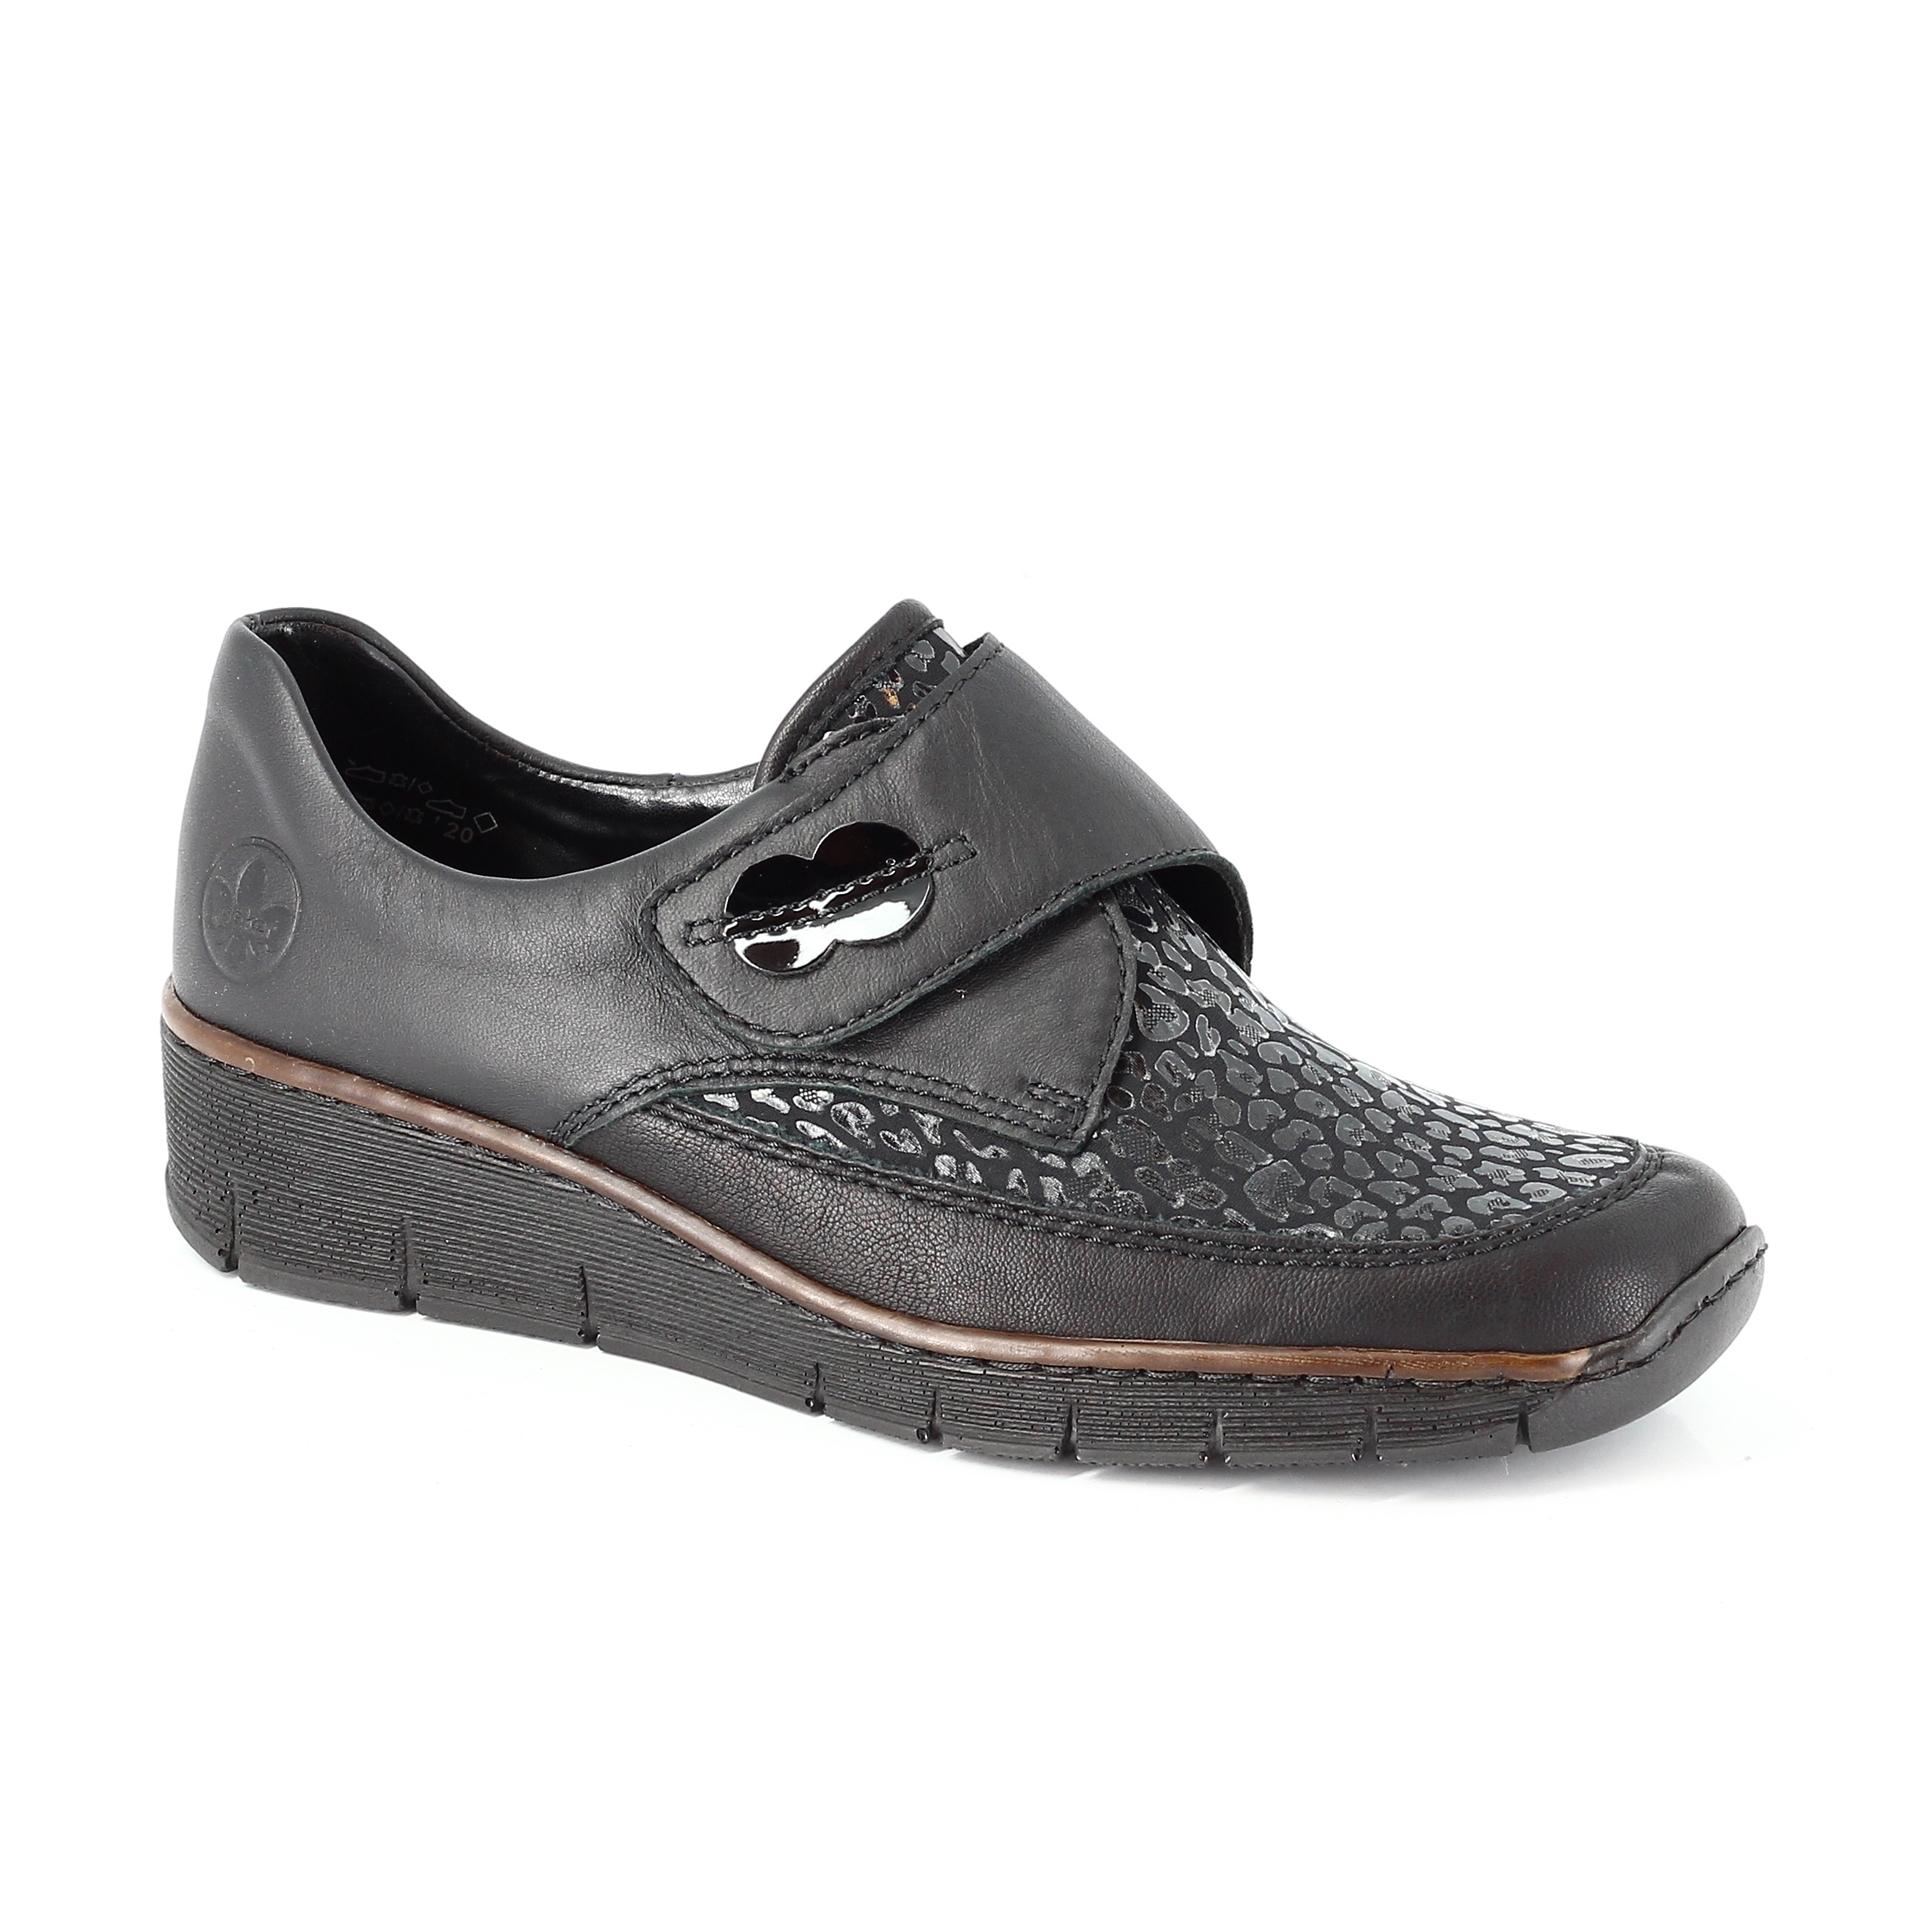 Bercolini Kényelmes cipők Rieker, férfi fél bőr